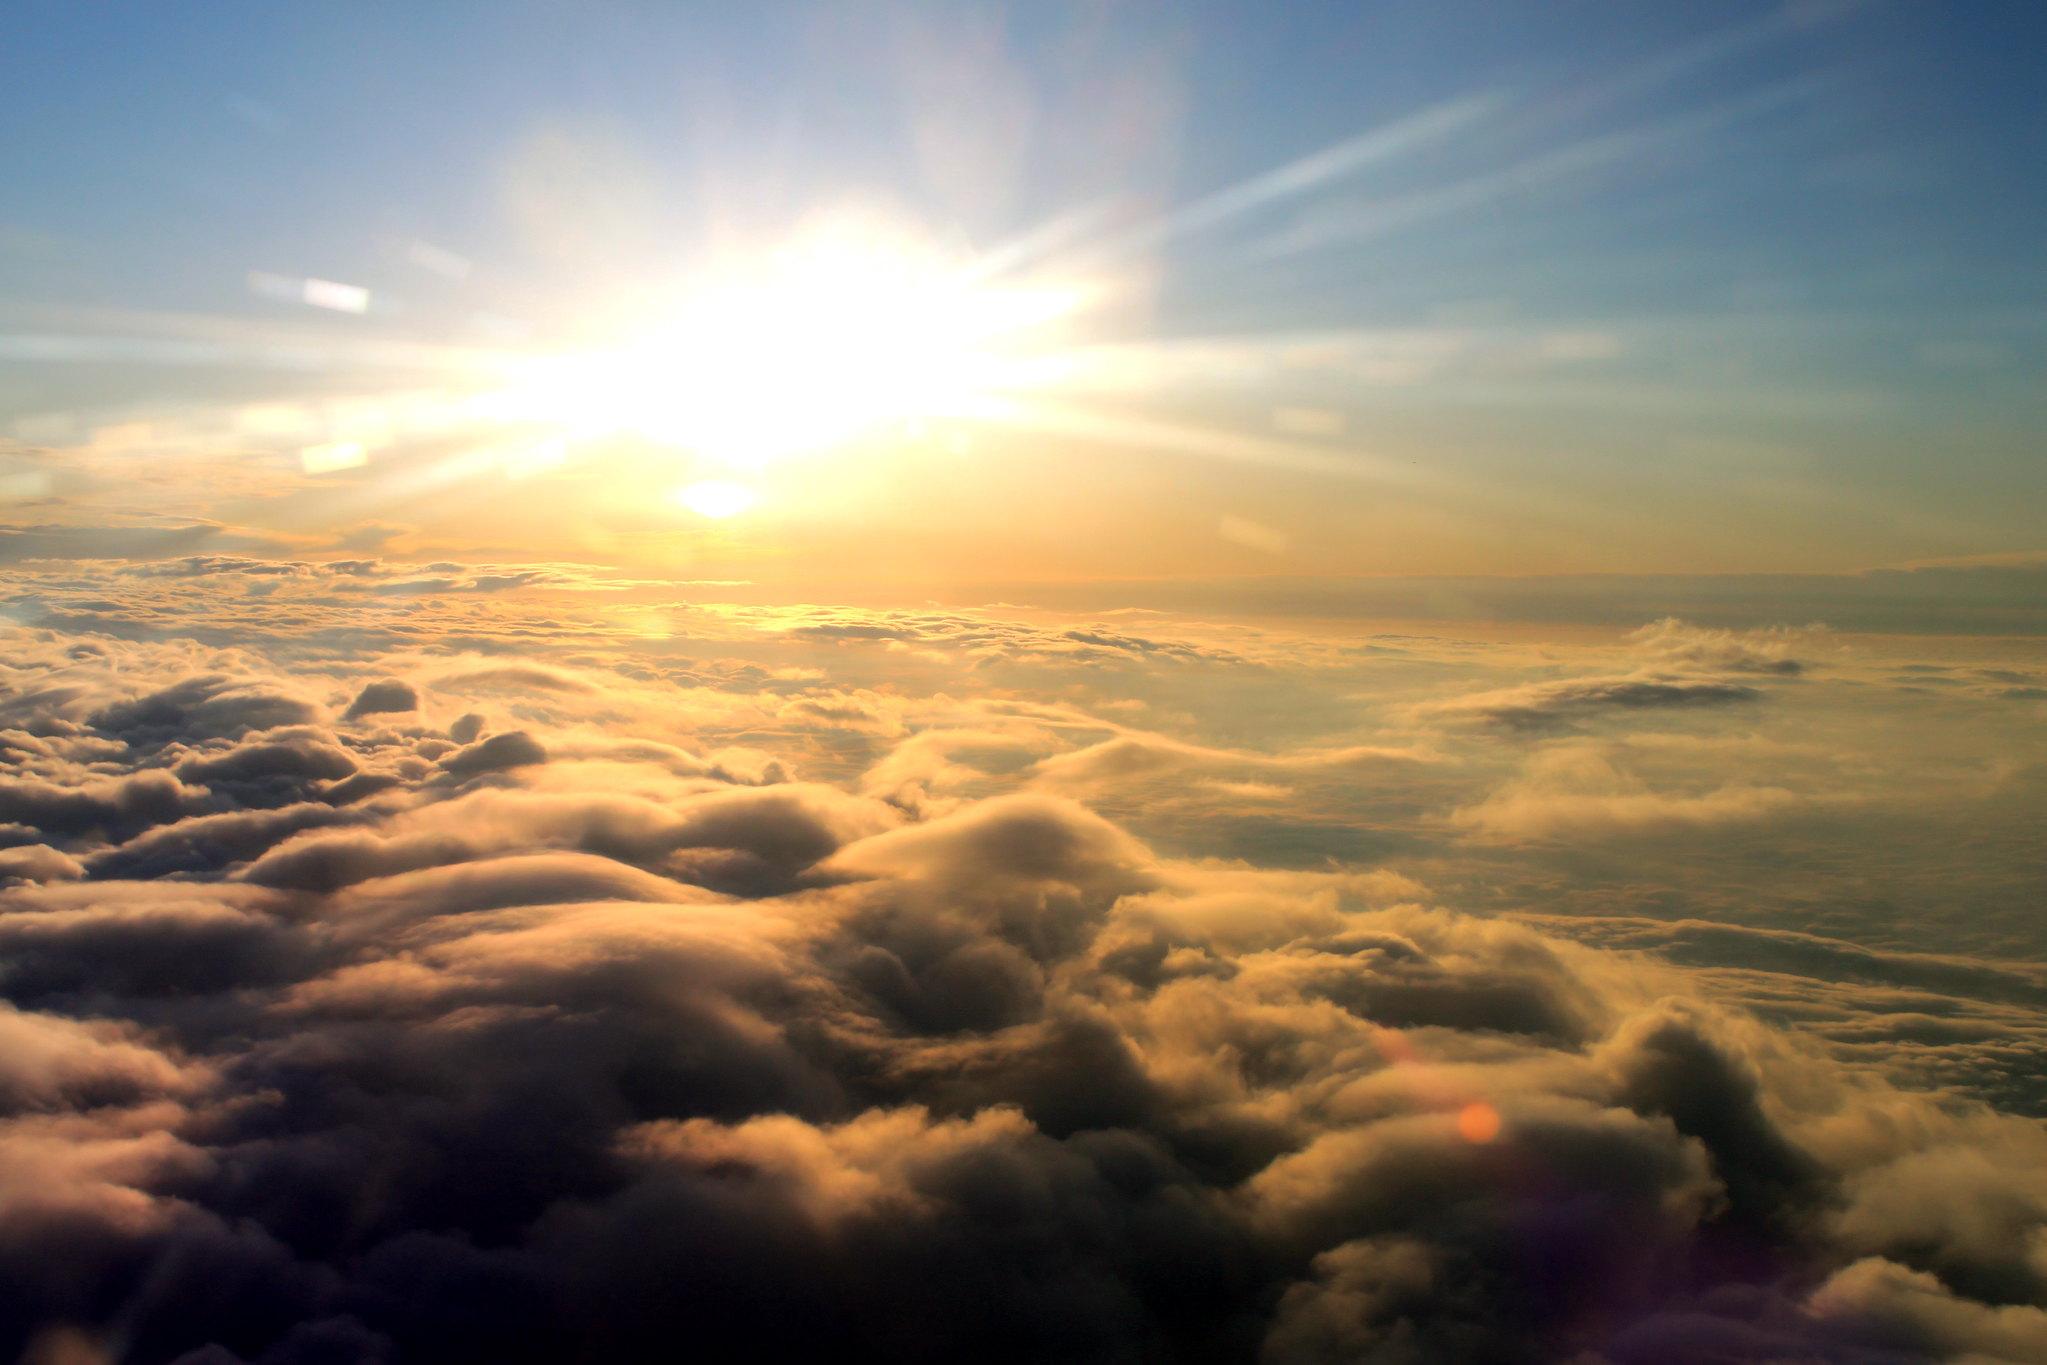 Heilpraxis Weg zu Dir - Sonne über den Wolken